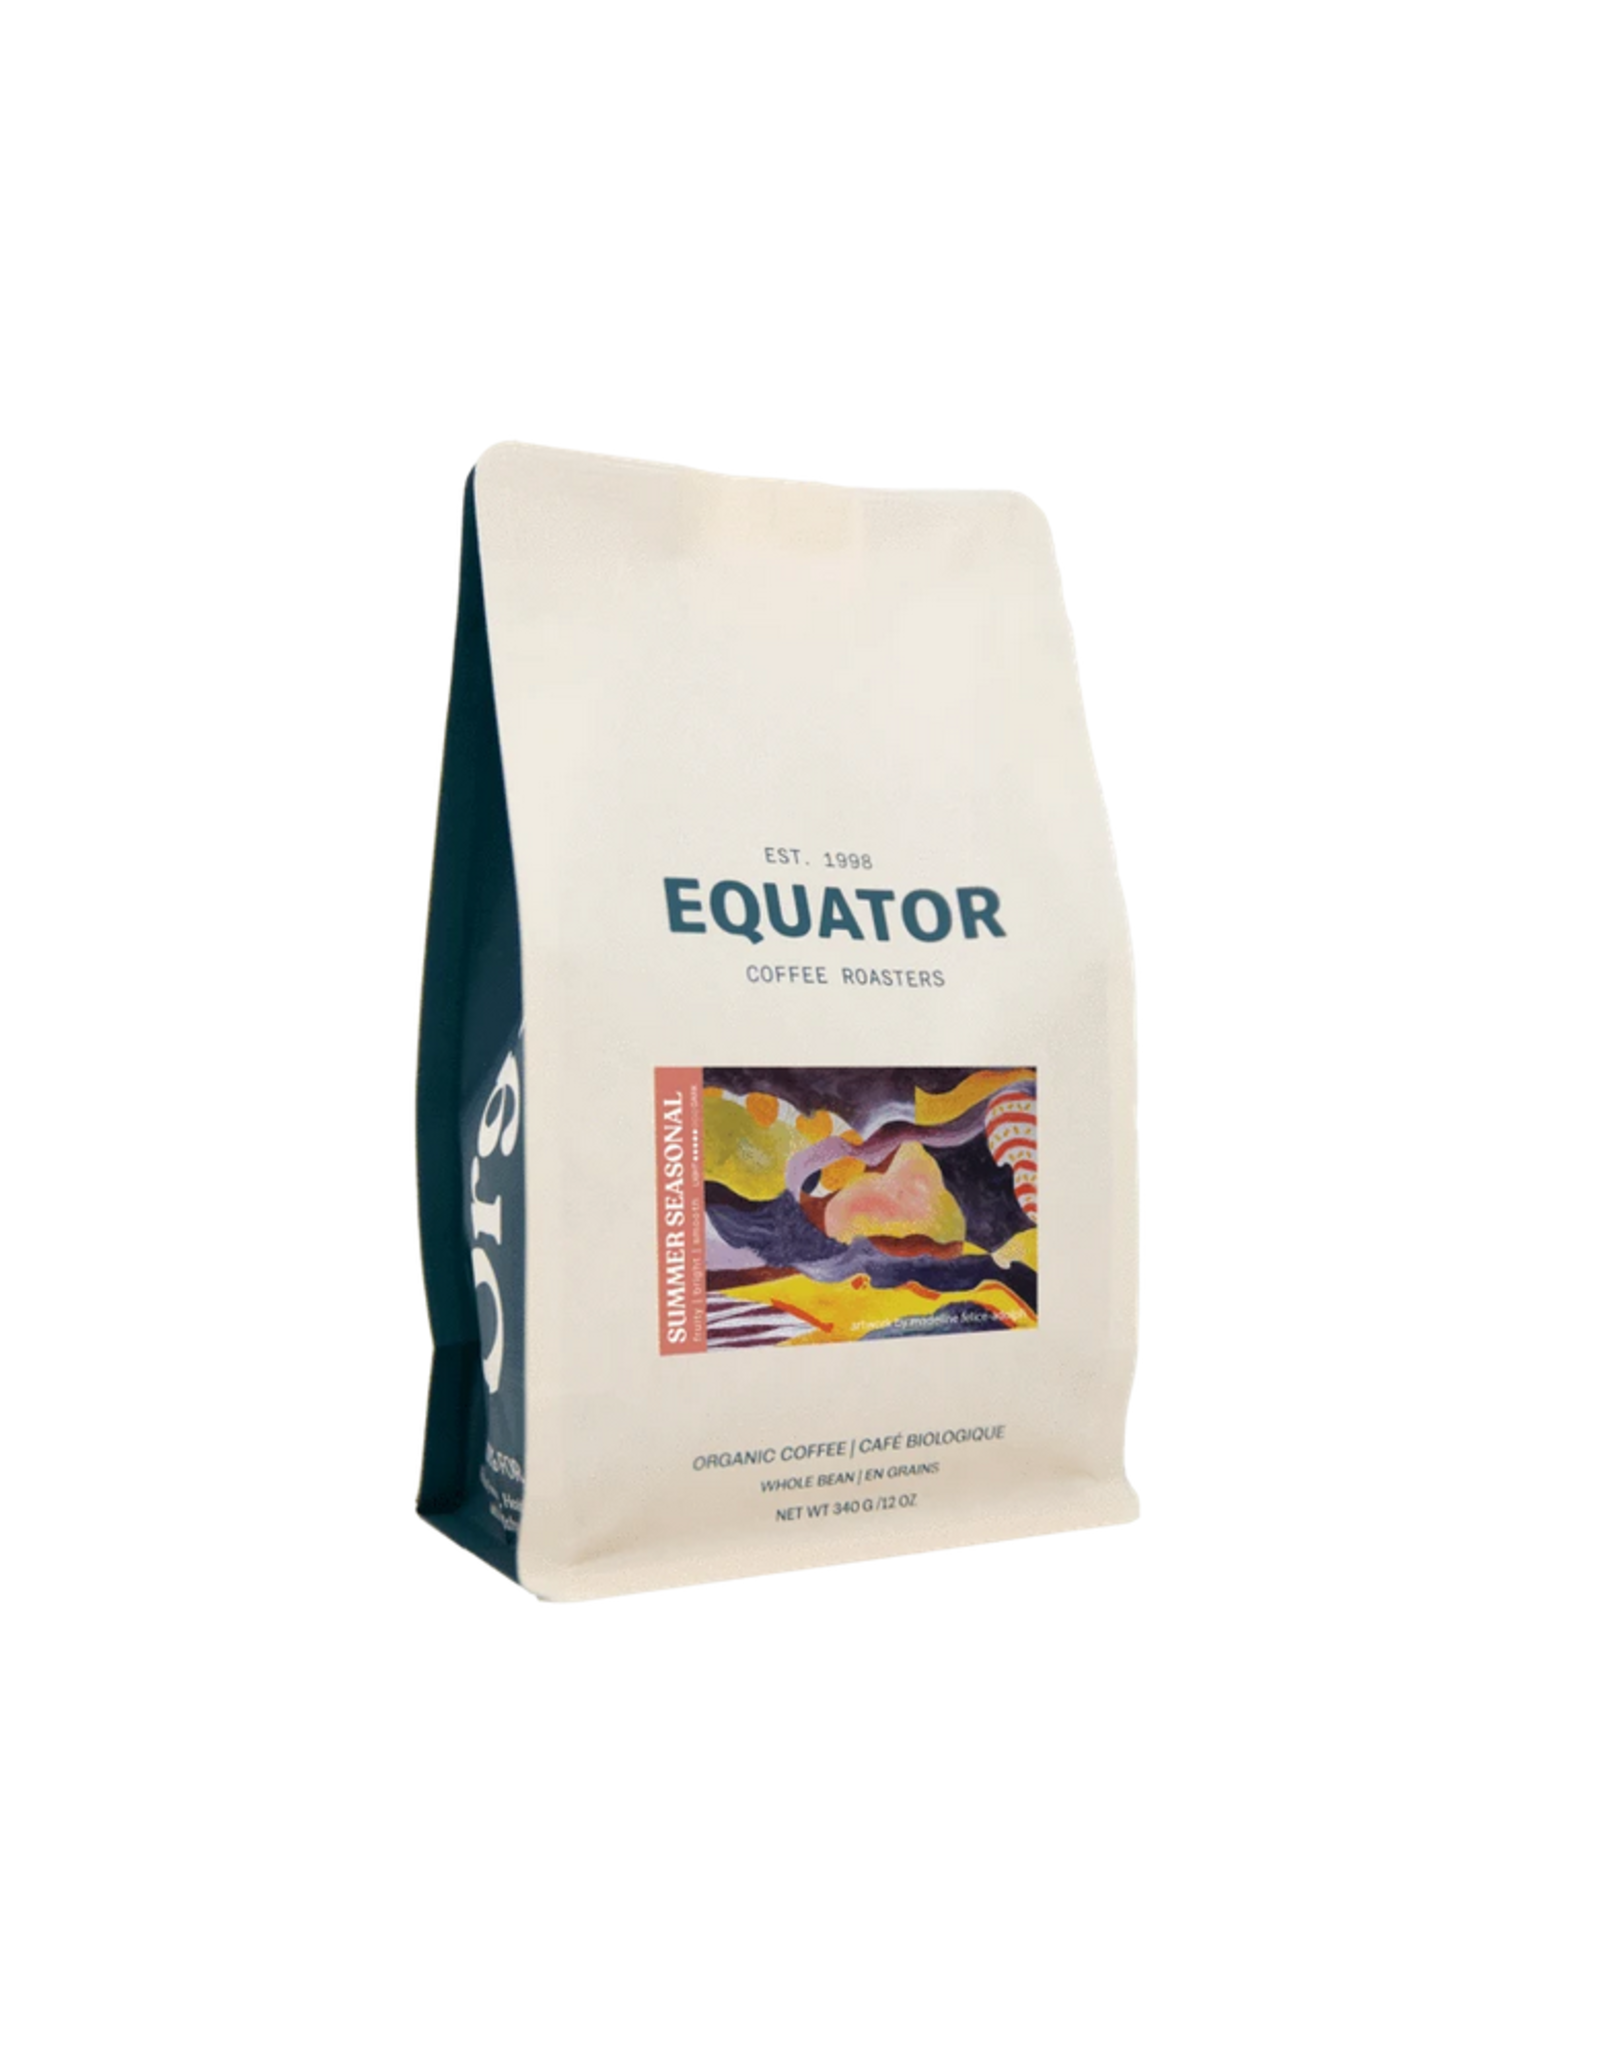 Equator Coffee Roasters Equator Coffee, Summer Seasonal Blend, 340g Beans